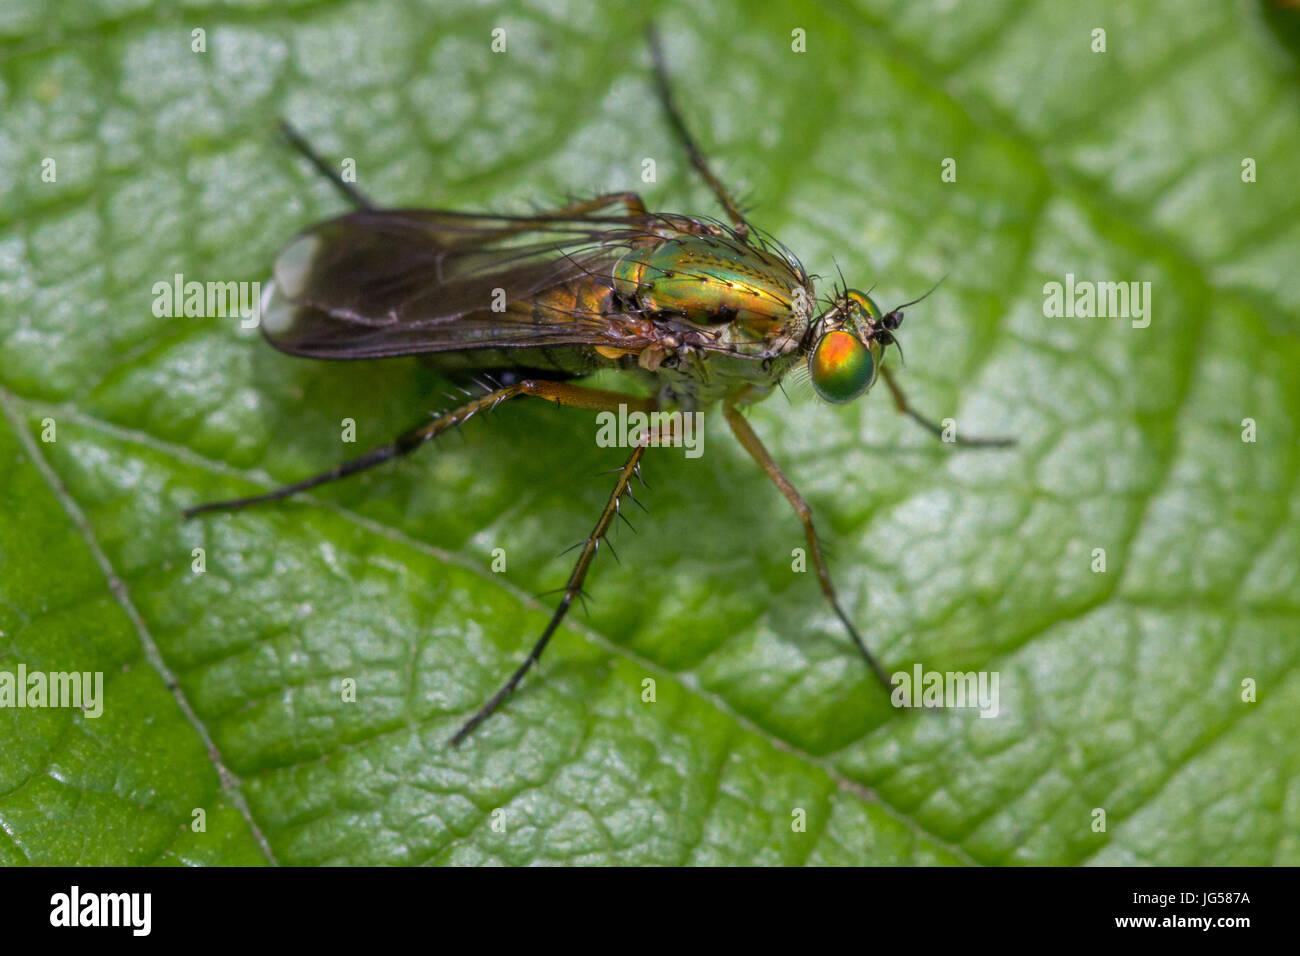 UK wildlife: attractive male semaphore fly (Poecilobothrus nobilitatus)   With lime green thorax & beautiful - Stock Image